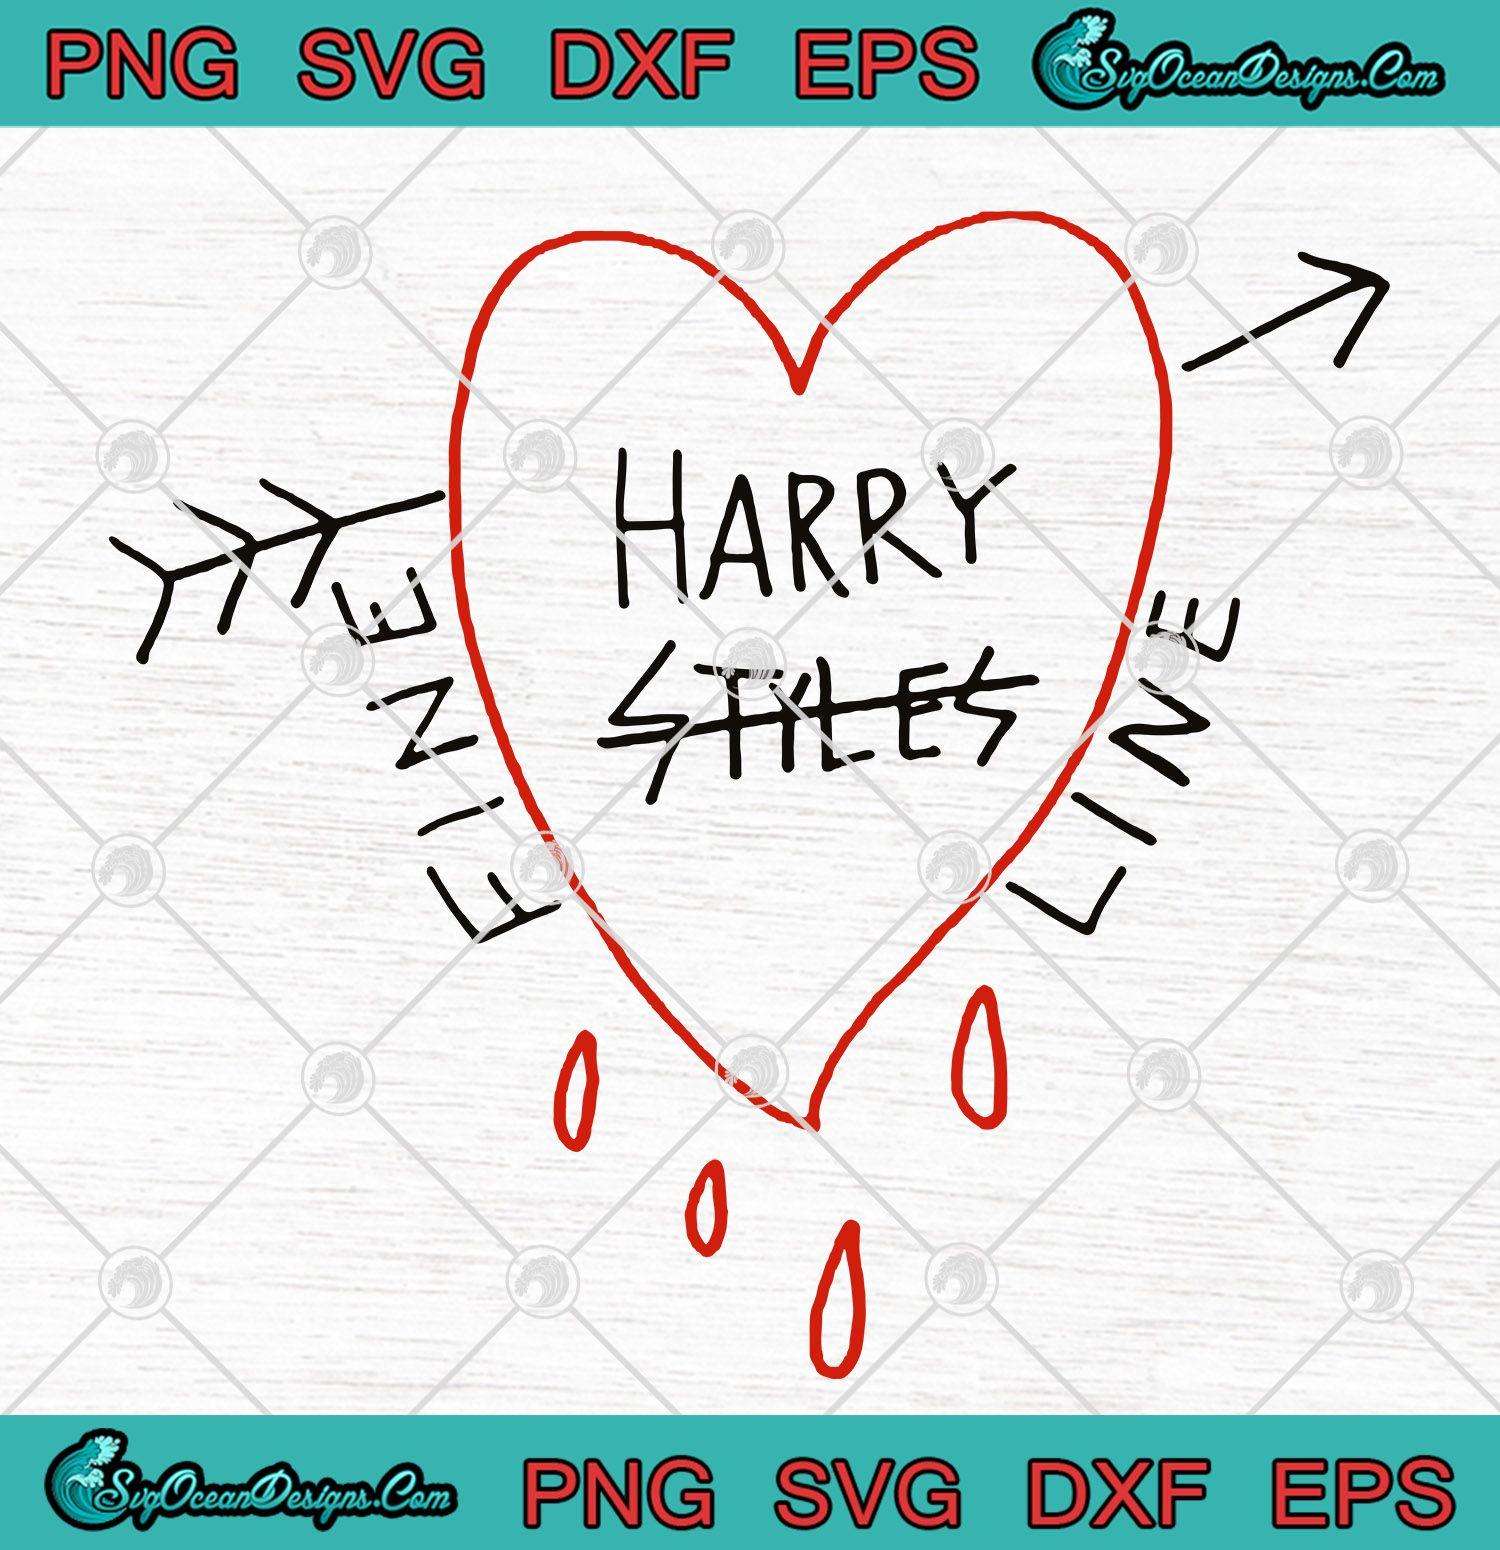 Harry Styles Fine Line Funny Svg Png Eps Dxf Digital Download Art Harry Styles Svg Line Sticker Funny Svg Harry Styles Poster